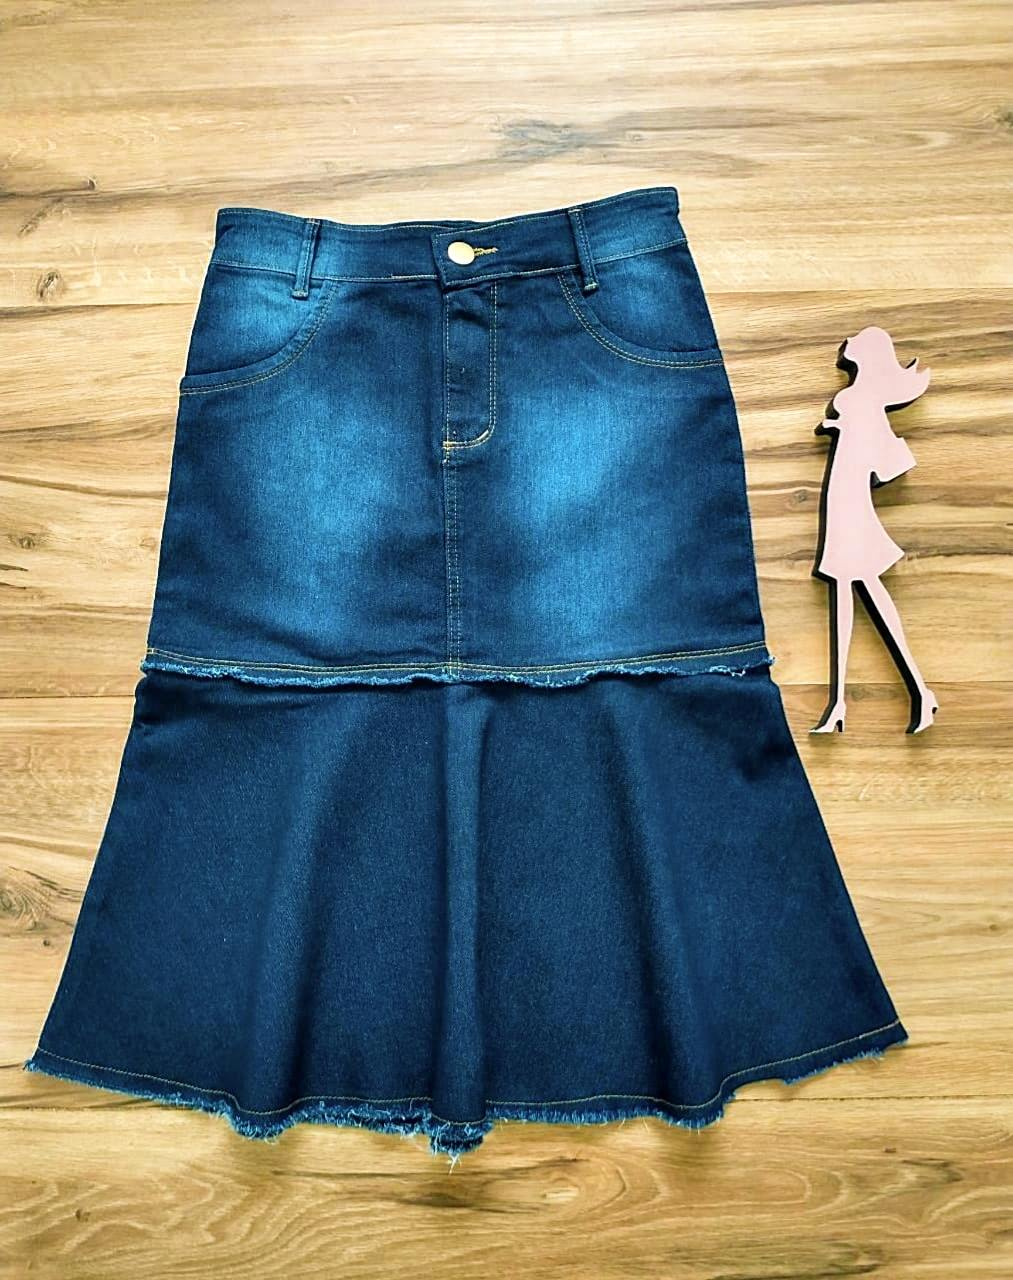 Saia Jeans Ellen SAIA BELLA SB991120 - Azul Escuro